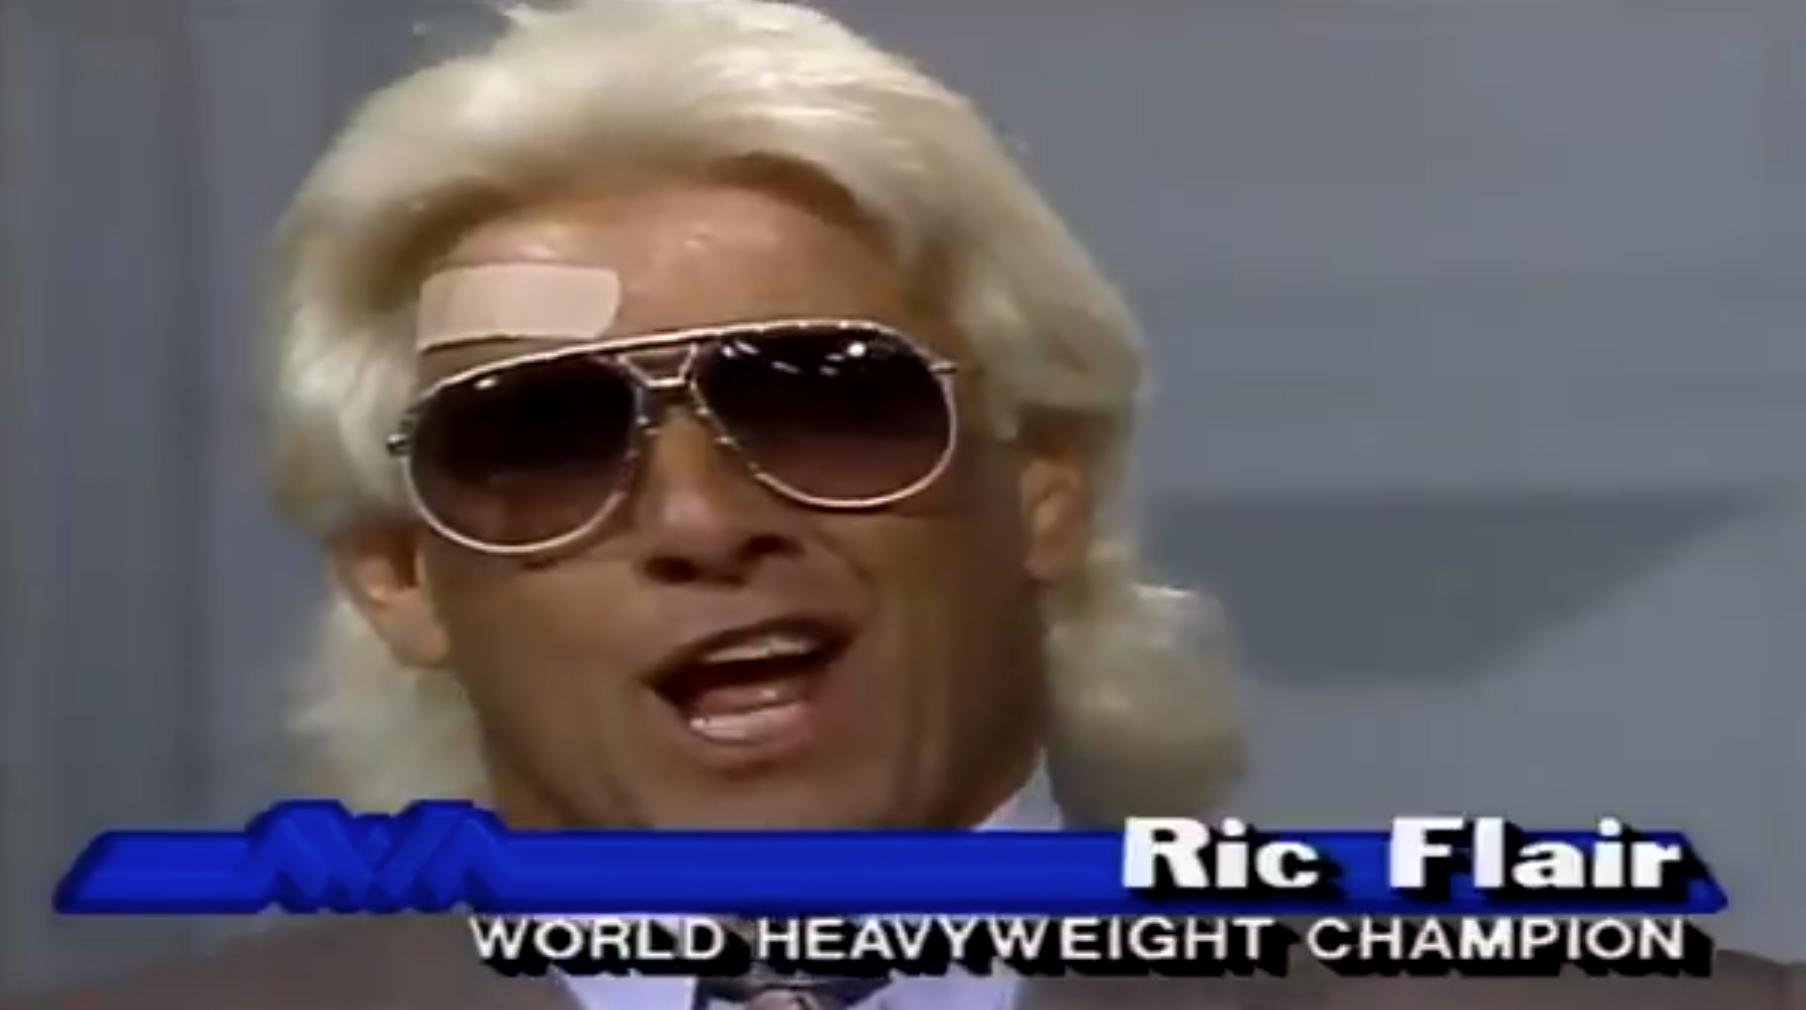 Ric Flair face injury